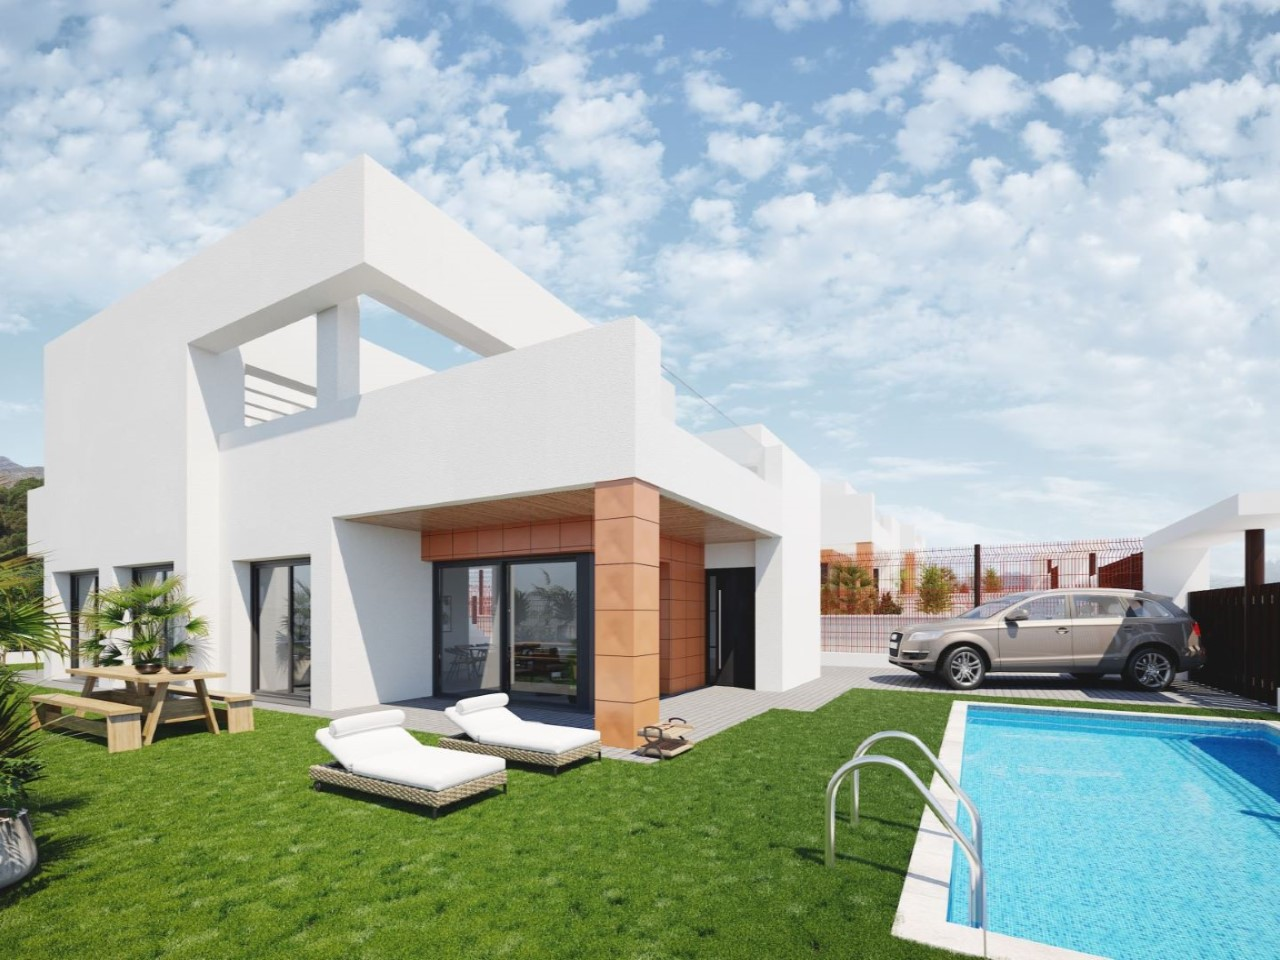 villa indépendante Espagne|villa indépendante|